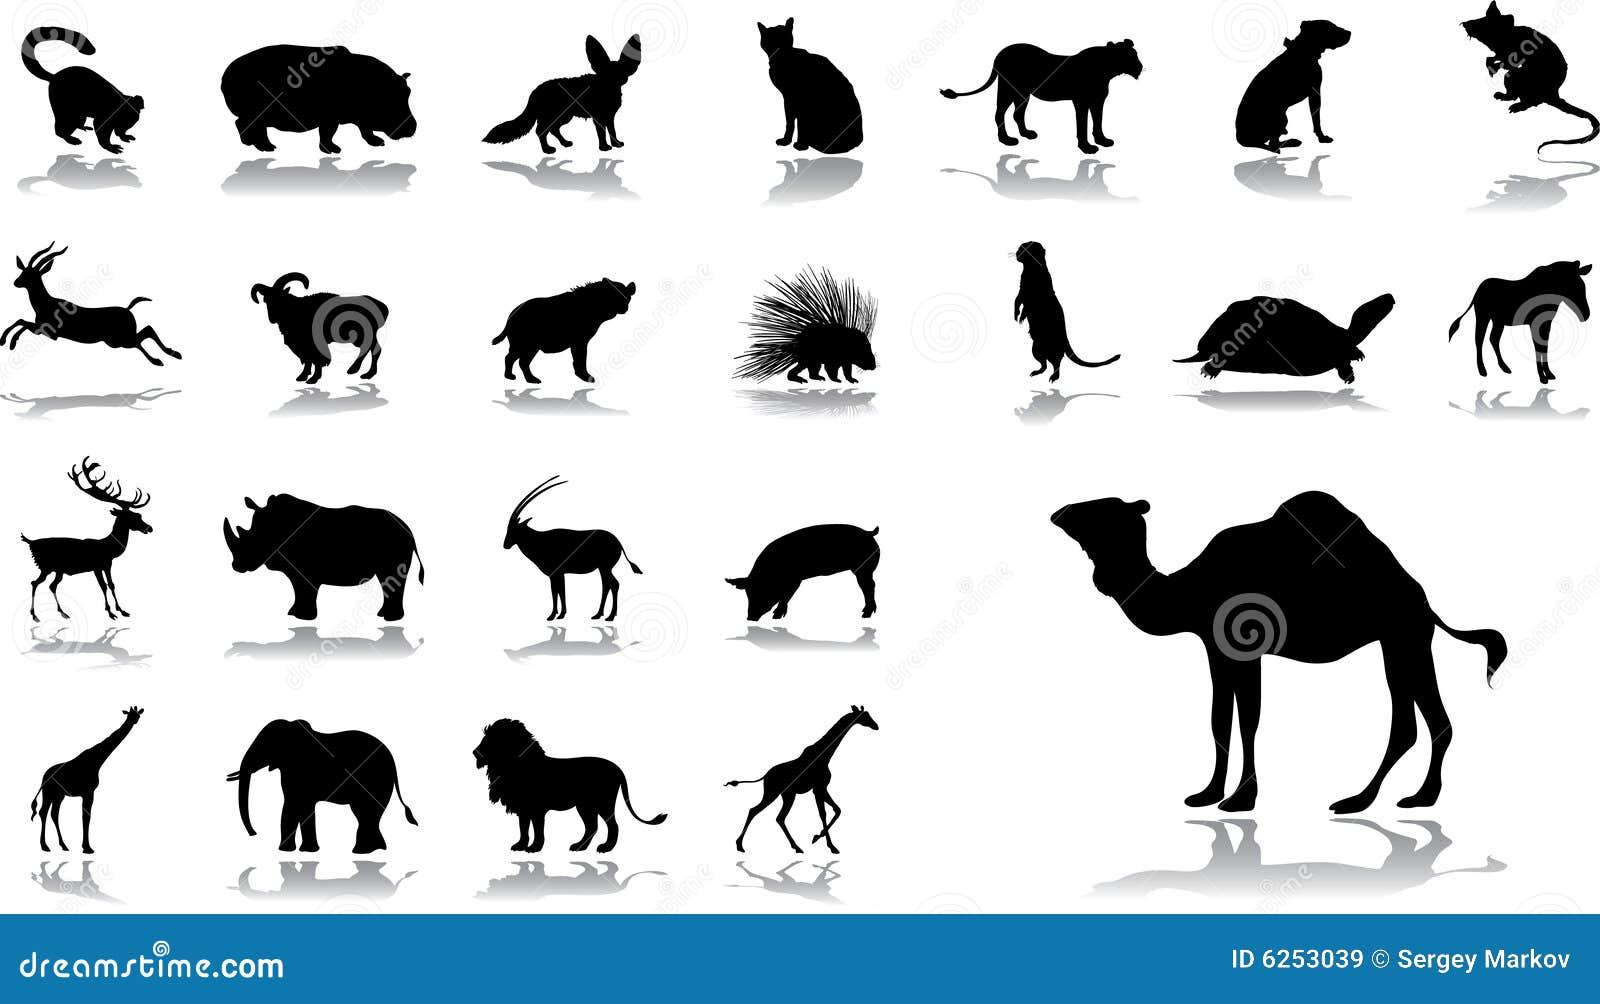 Big set icons - 11. Animals